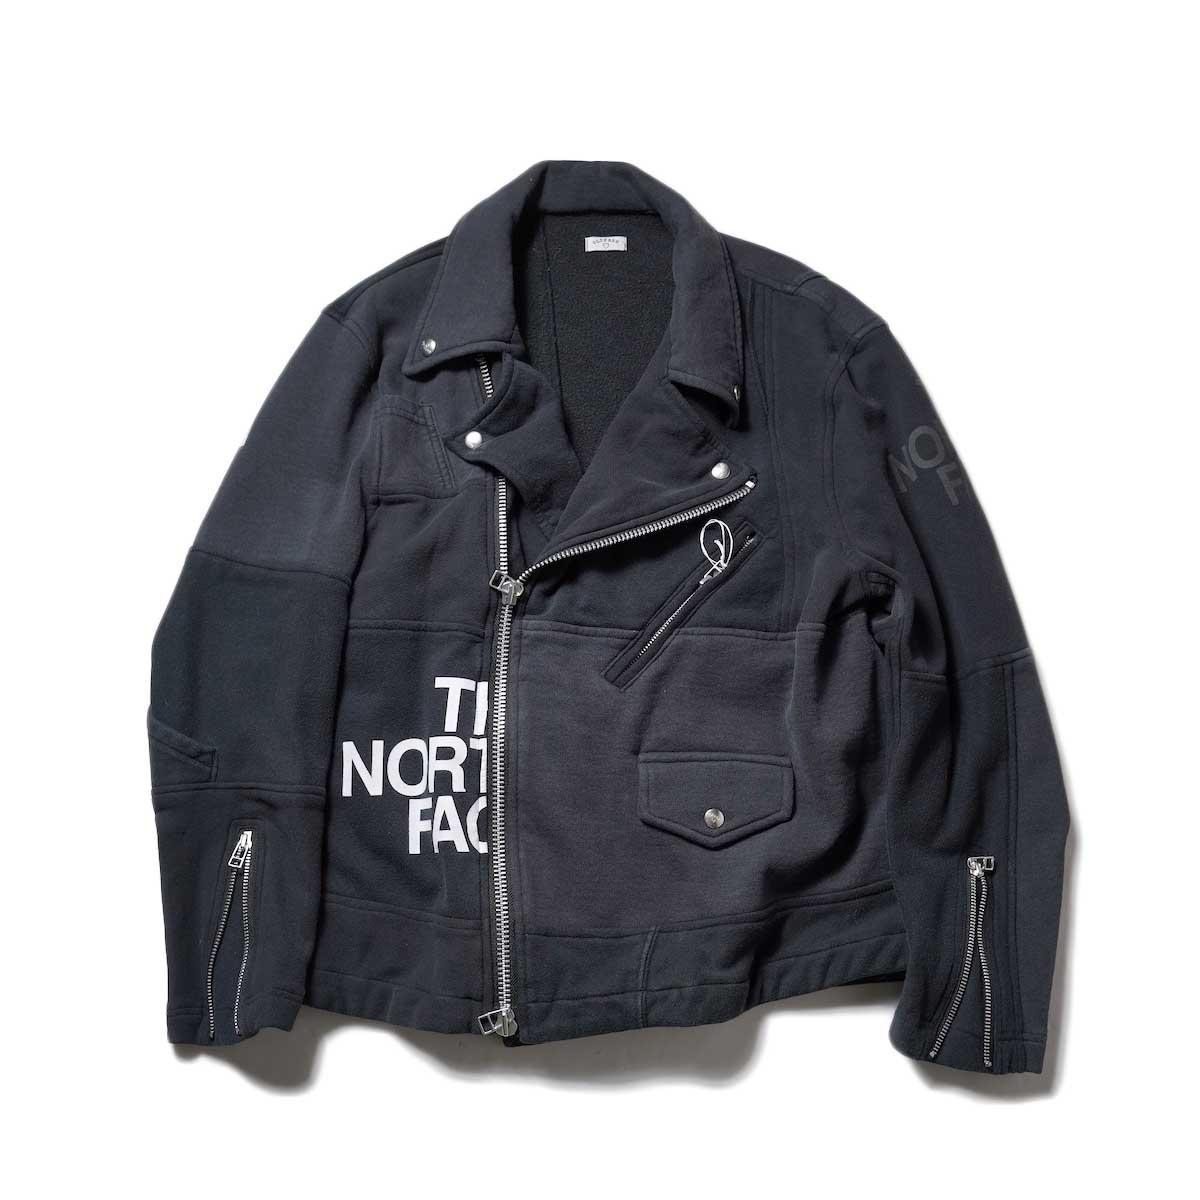 OLD PARK / Oversized Riders Jacket -Sweat-Black